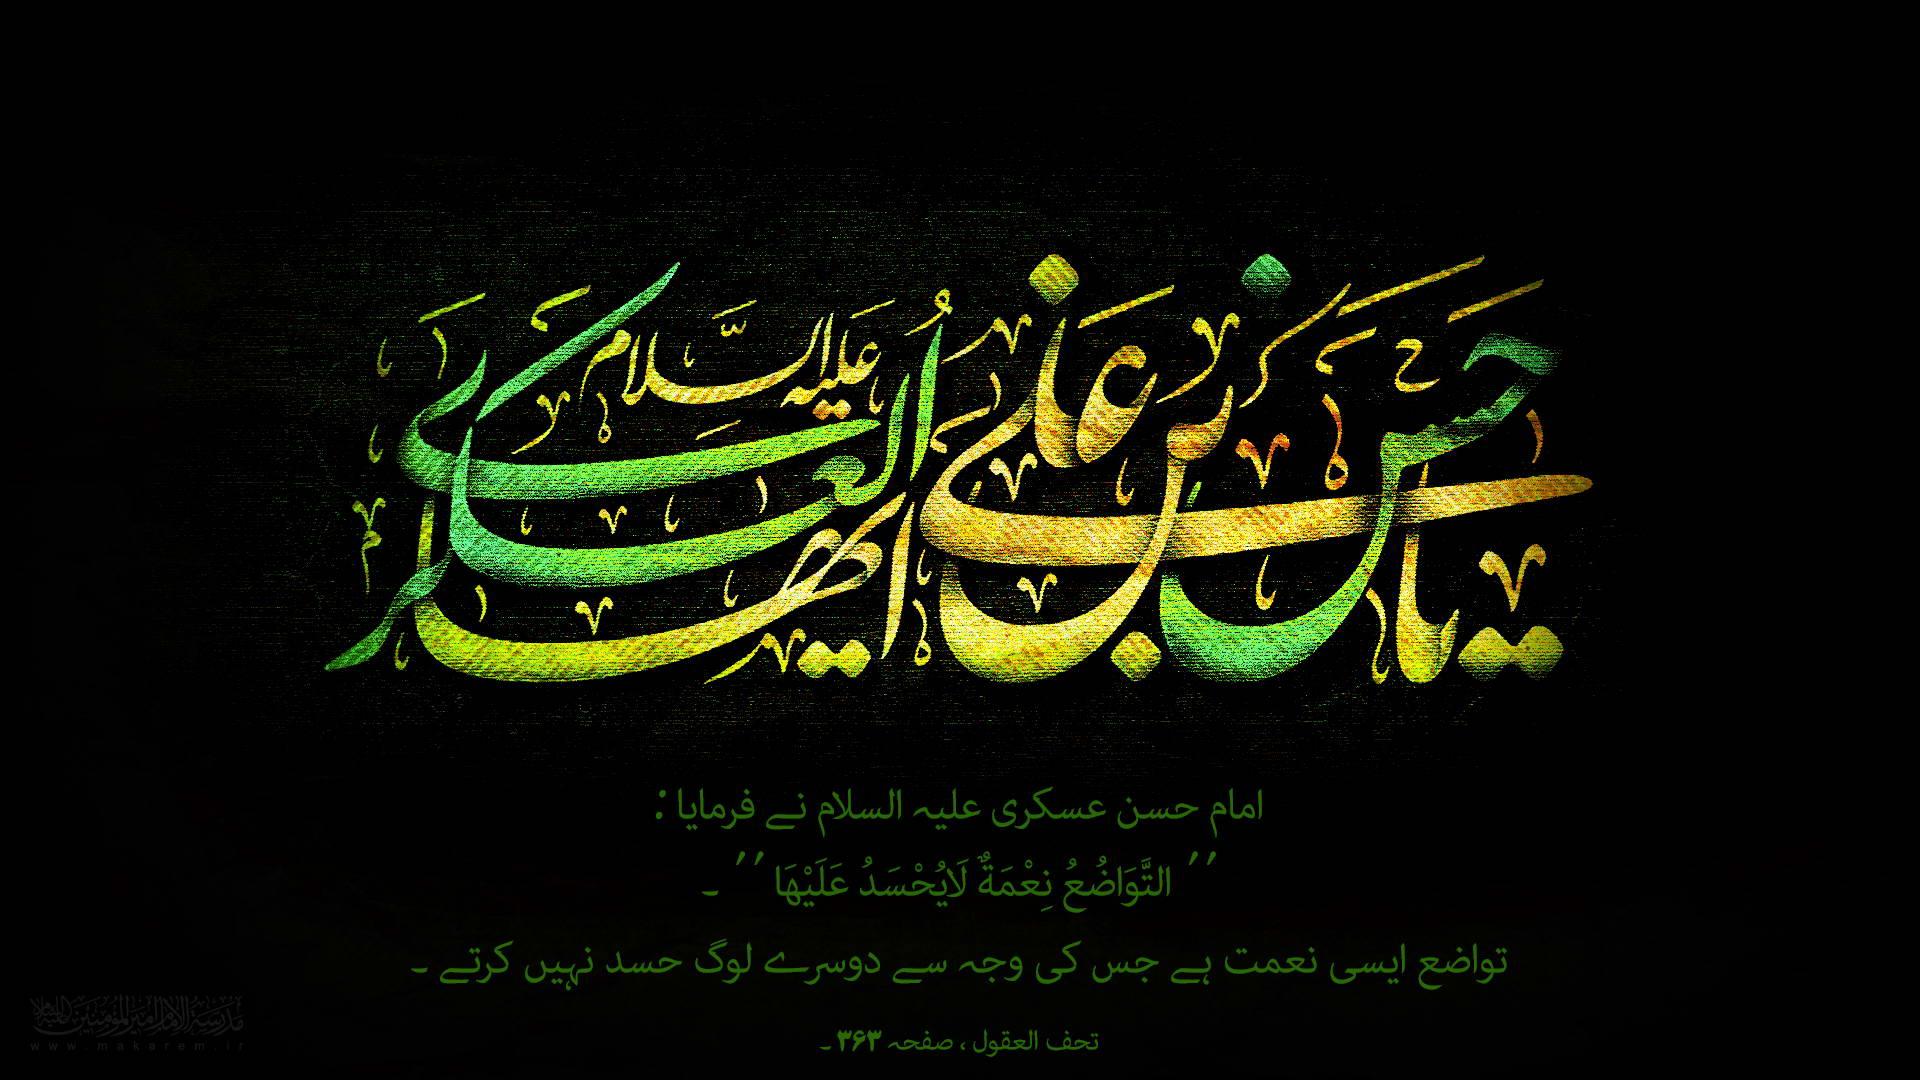 شهادت امام حسن عسکری (ع)-مدرسه الامام امیر المومنین (ع)